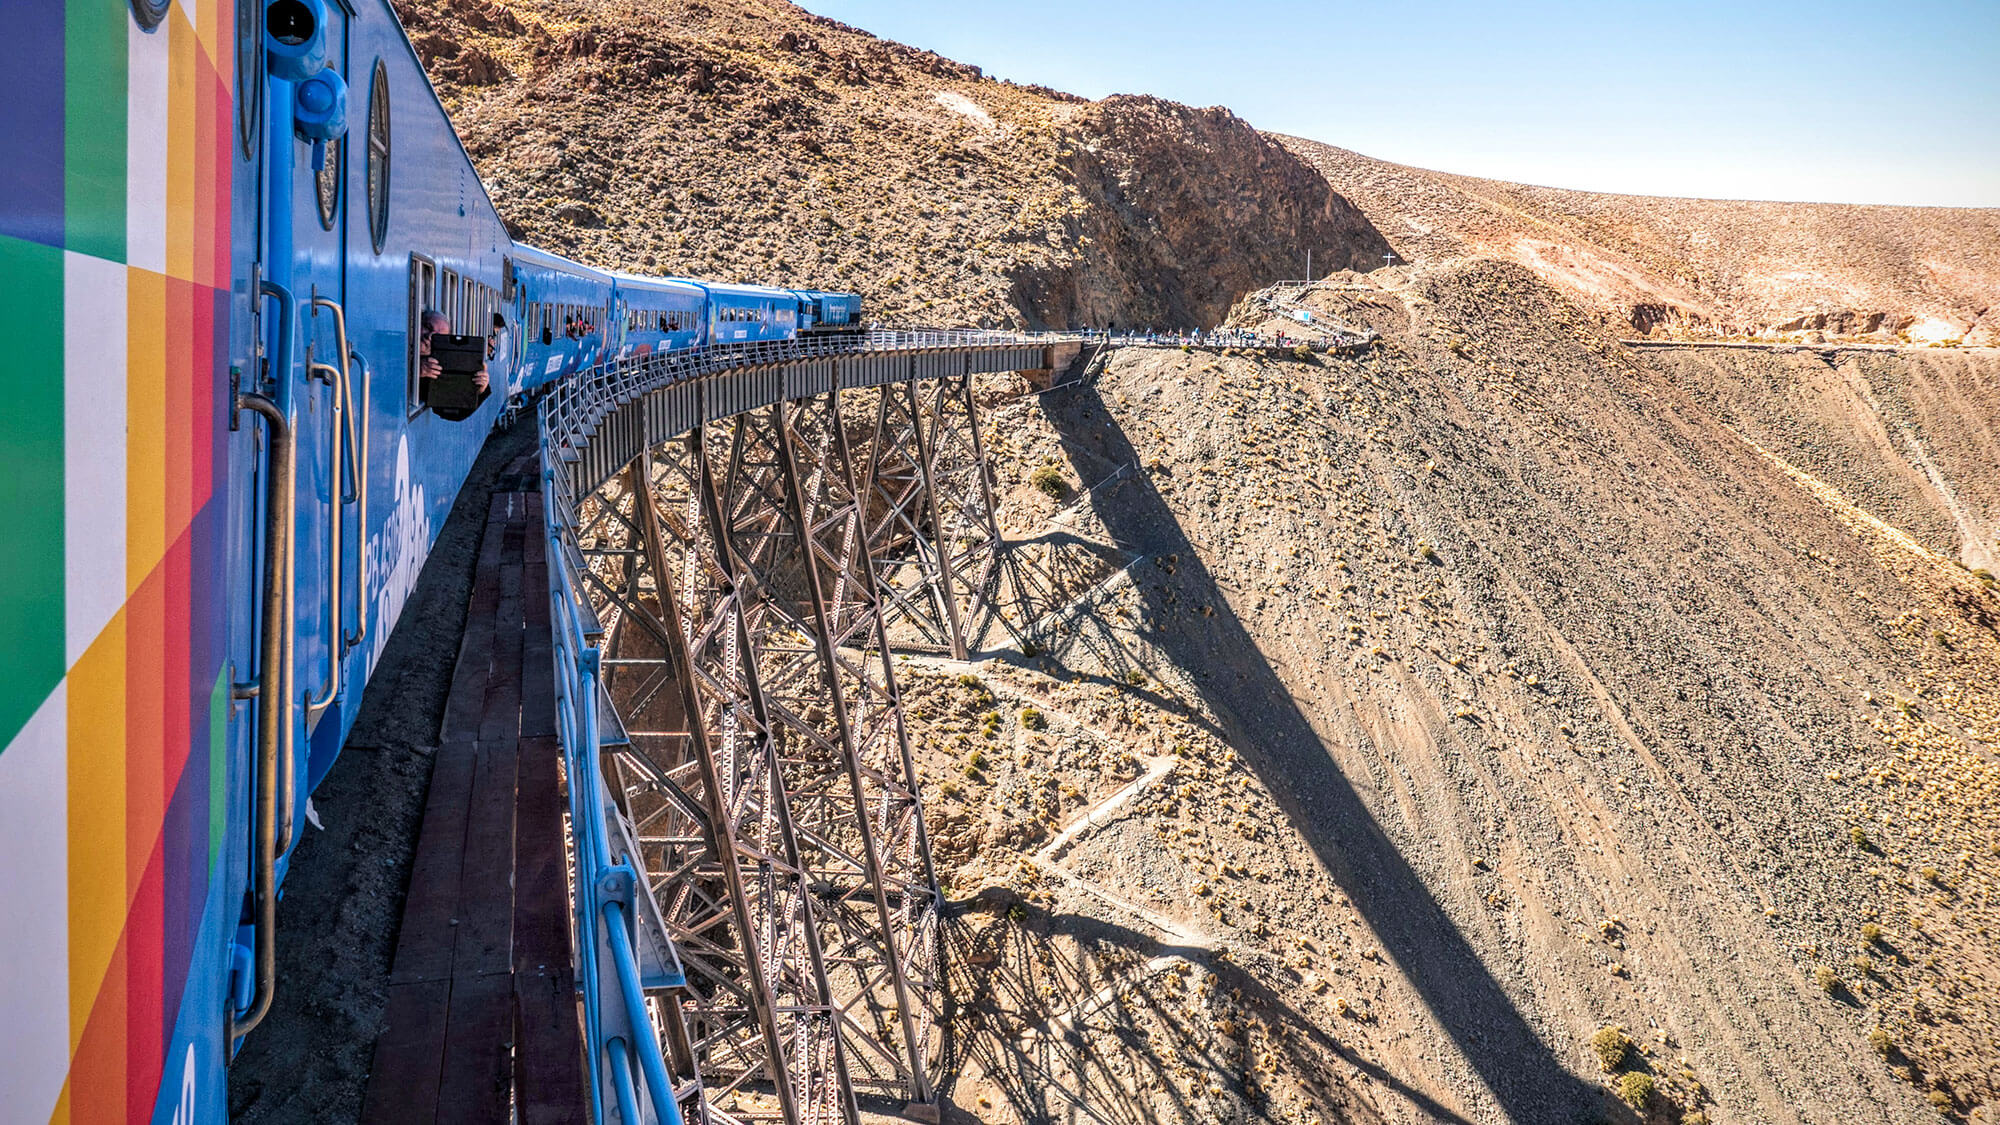 Tren a las Nubes at the Polvorilla Viaduct